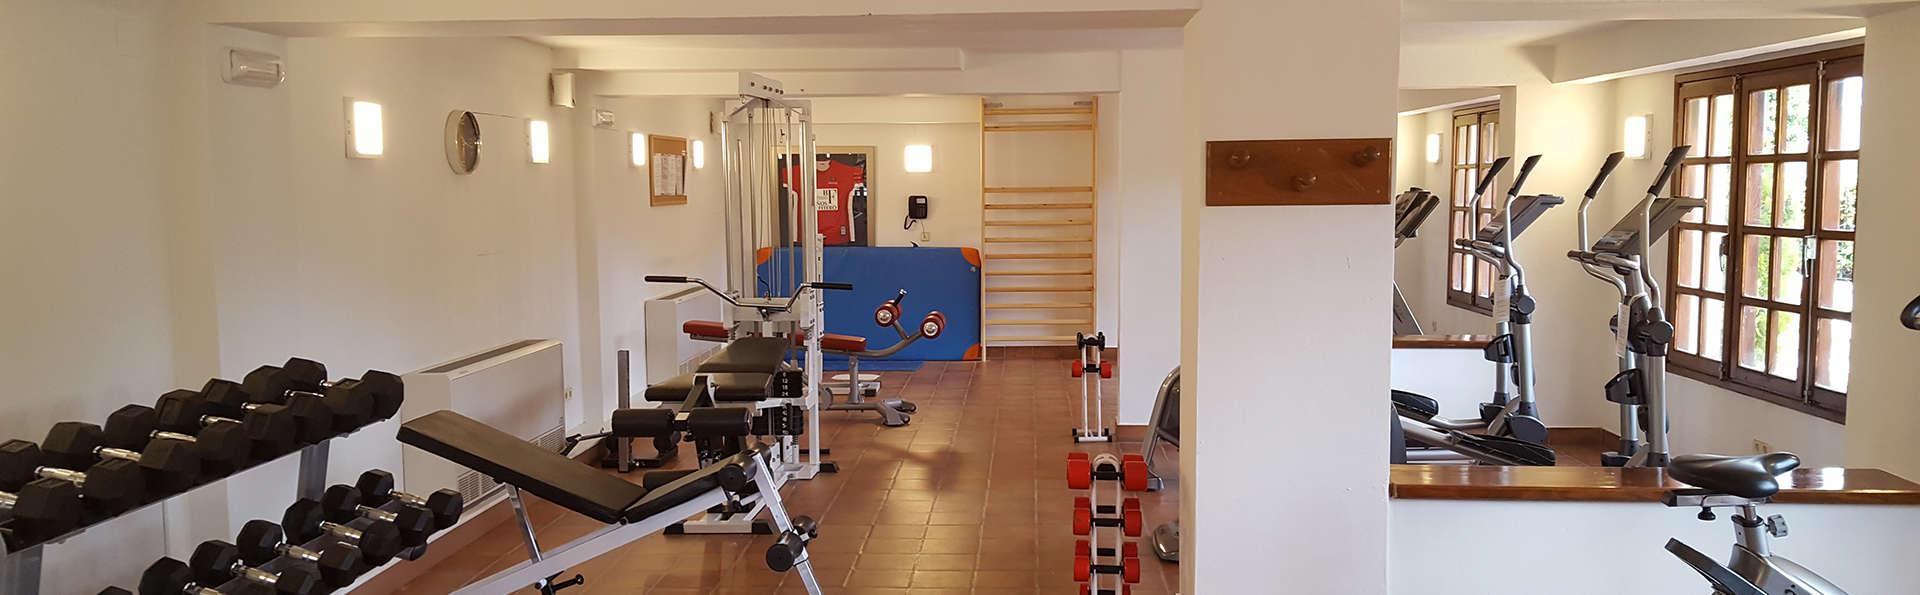 Balneario de Fitero - Hotel Bécquer - EDIT_fitness.jpg